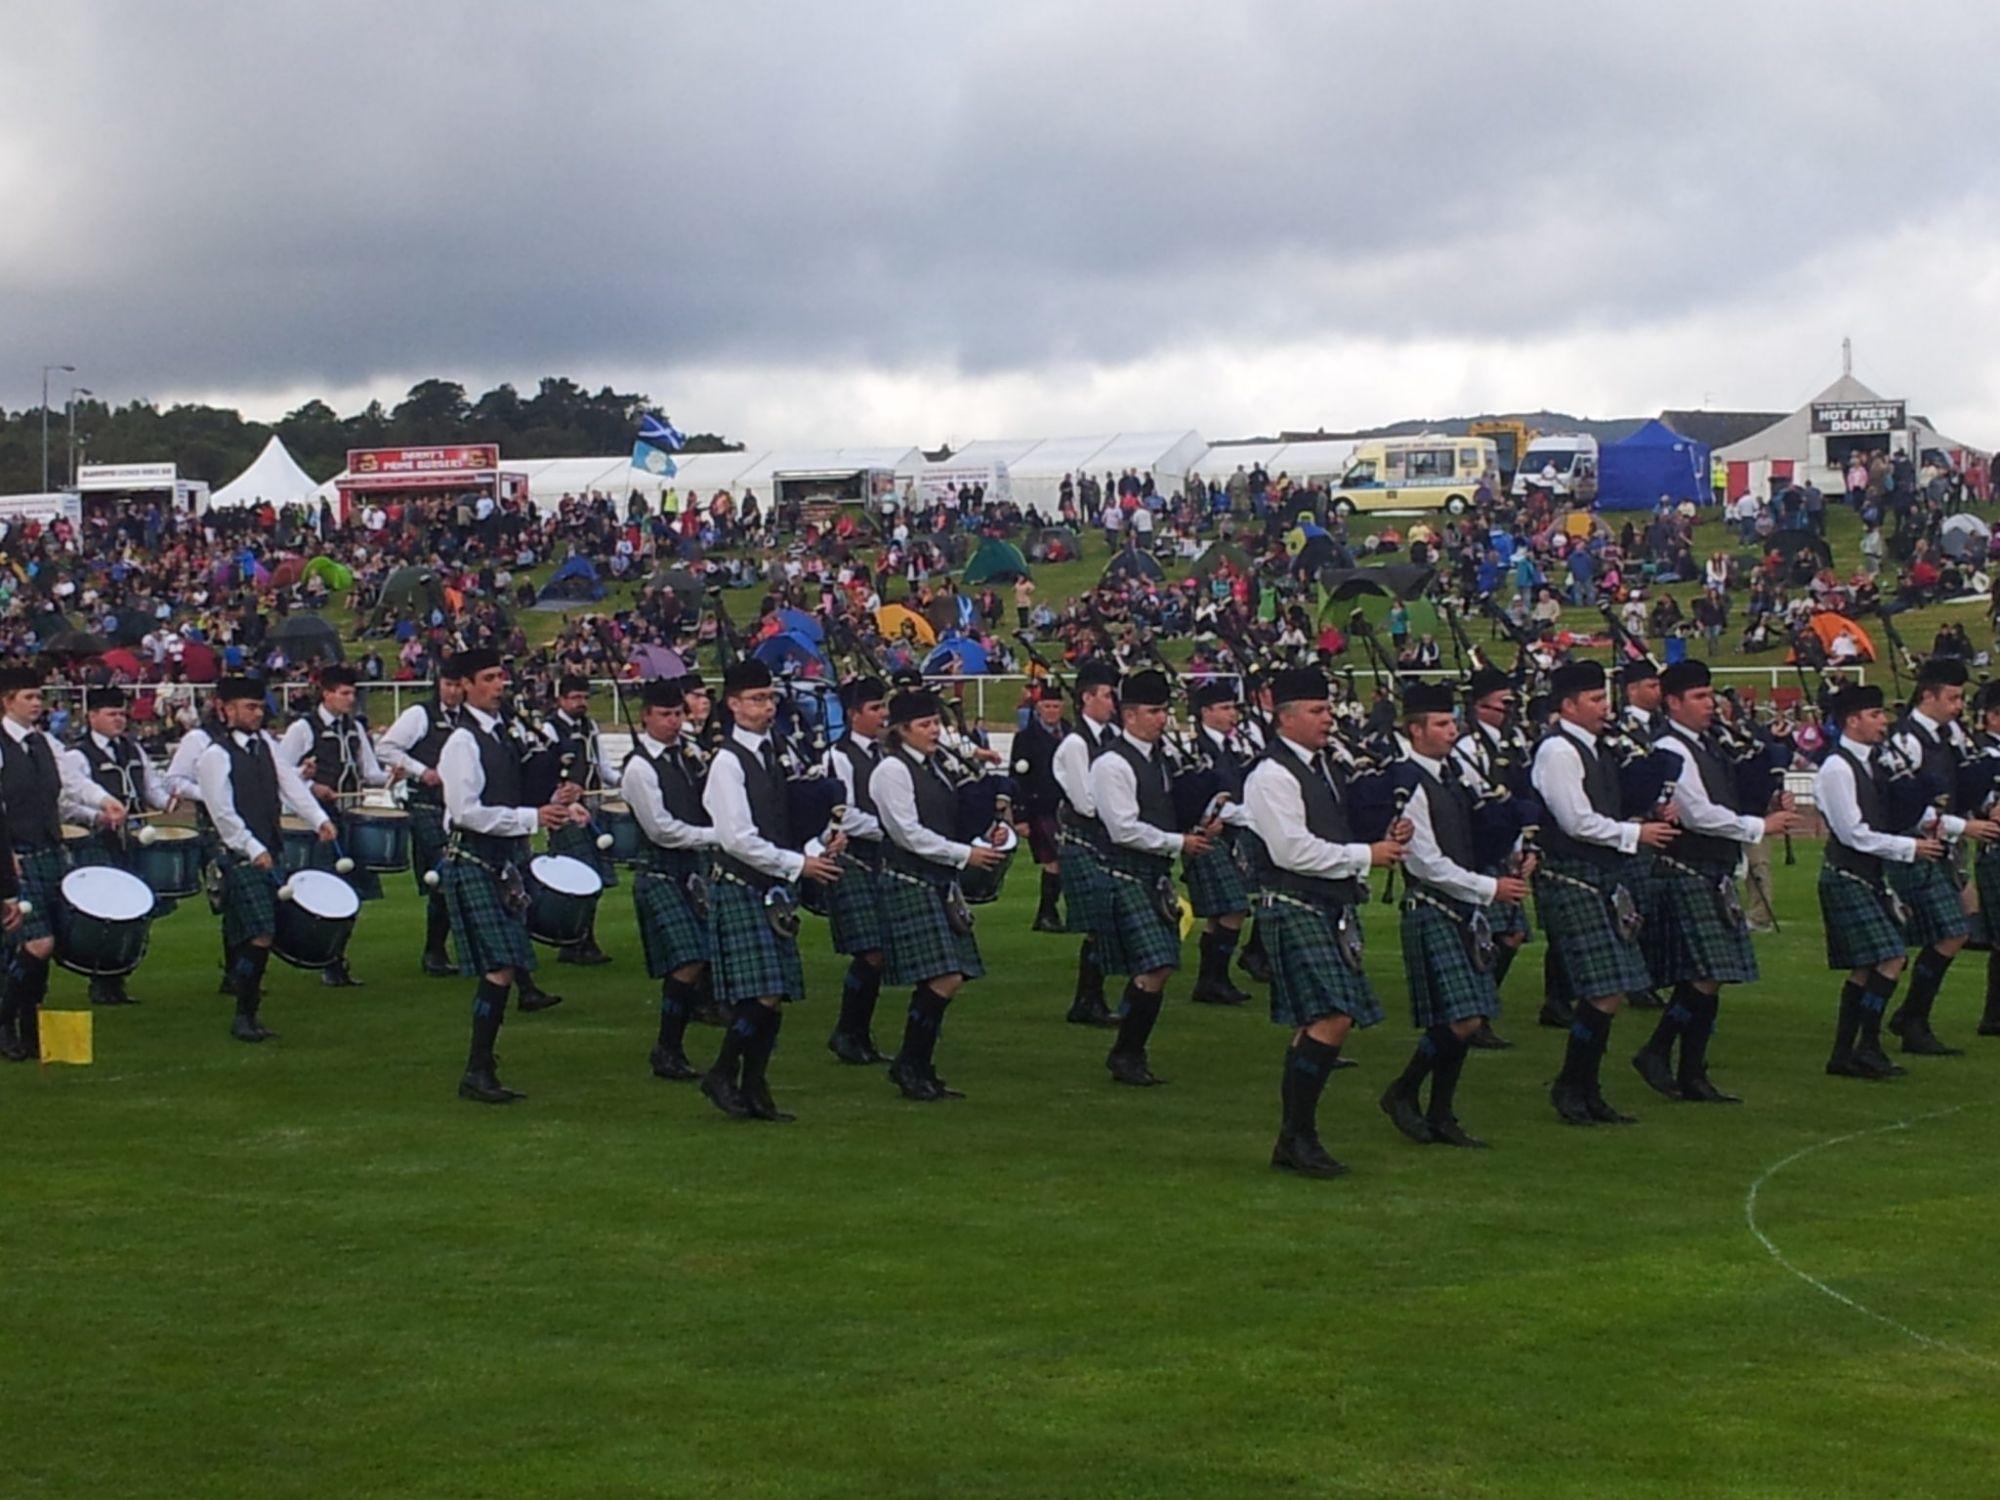 Inverary & District Pipe Band: Band Ties at Championship